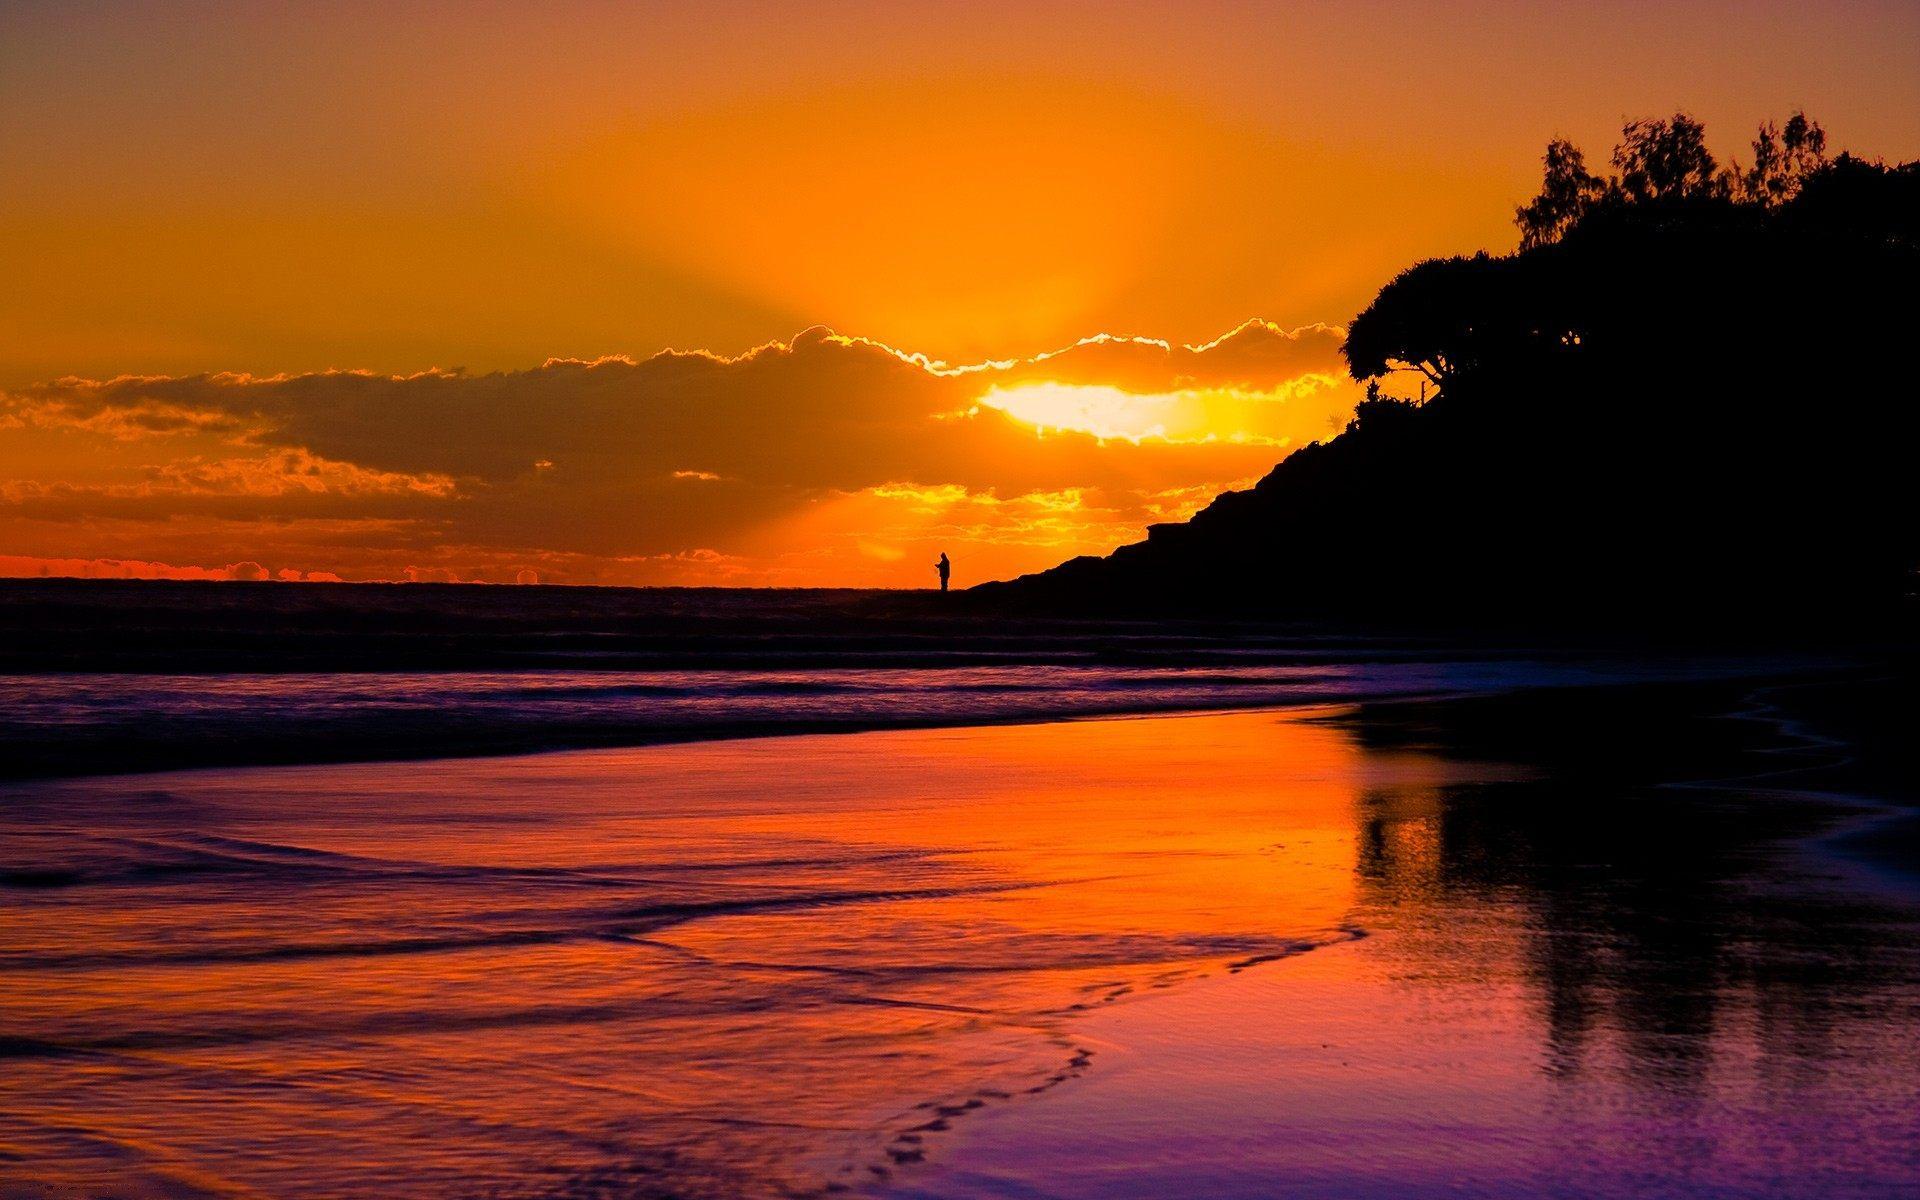 Download Sunset Wallpaper wallpaper, 'Watching Sunset'.